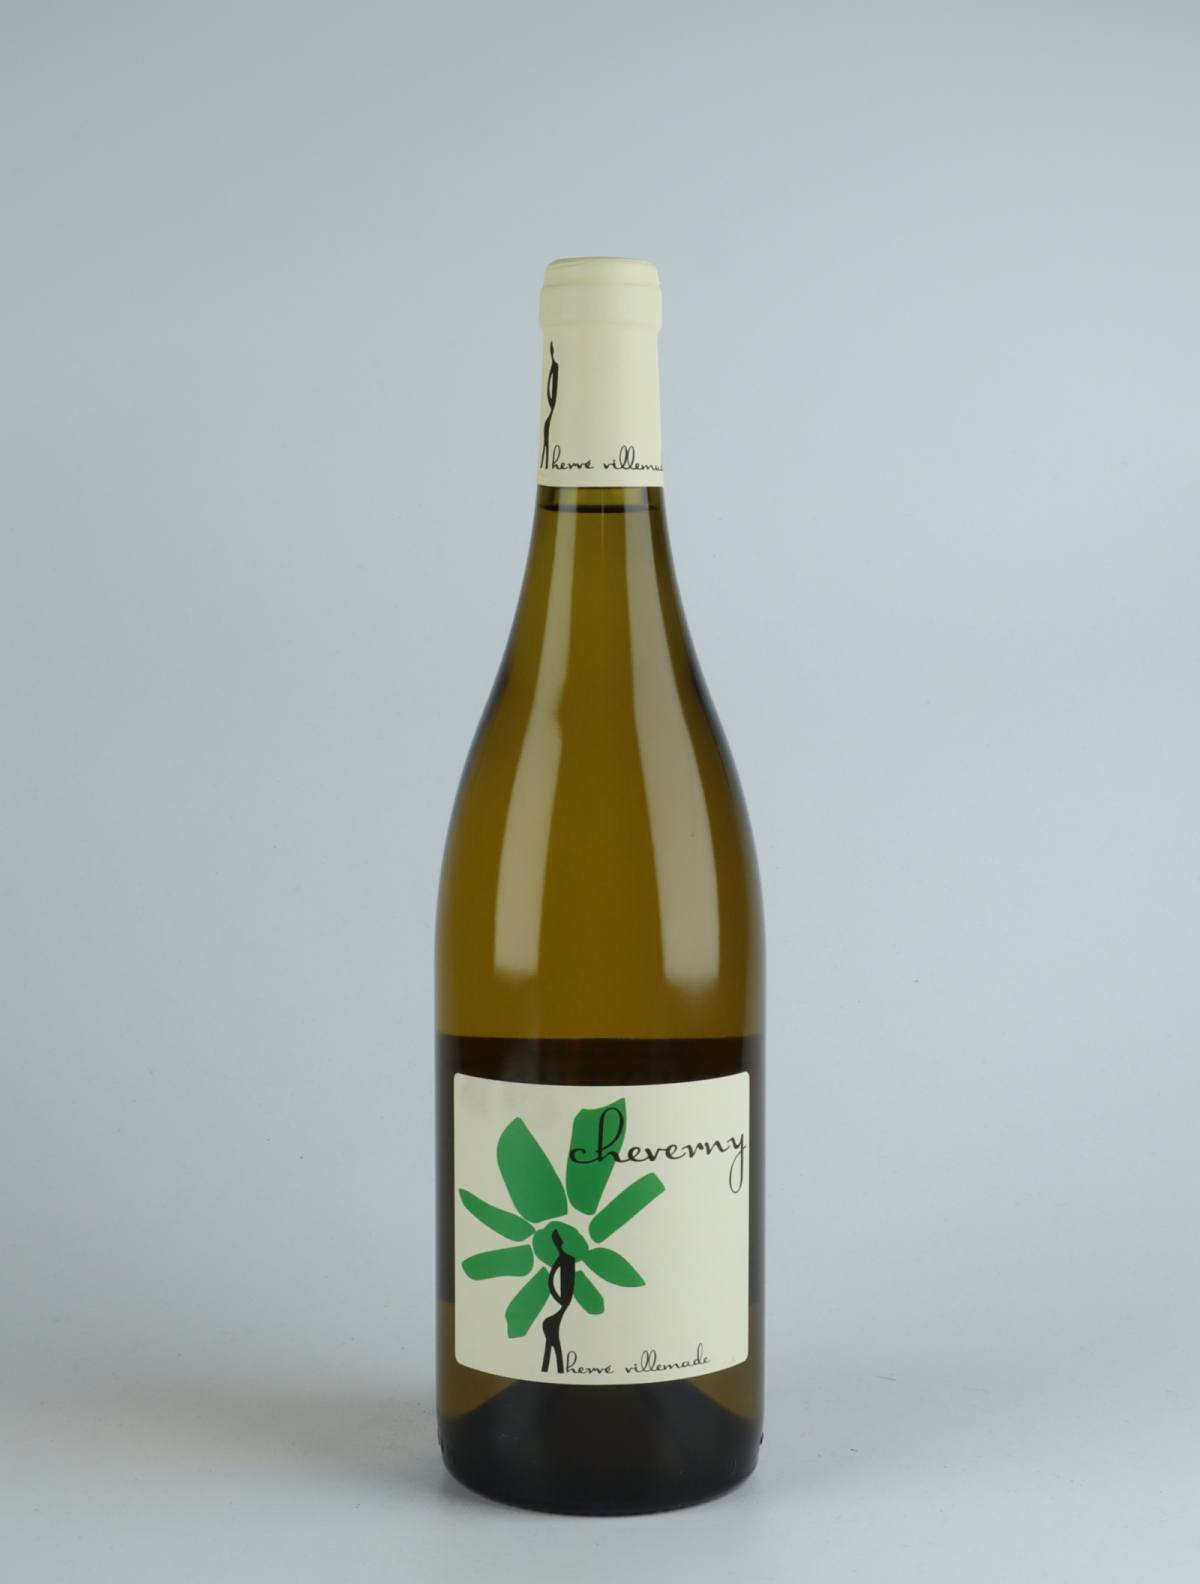 Cheverny Blanc